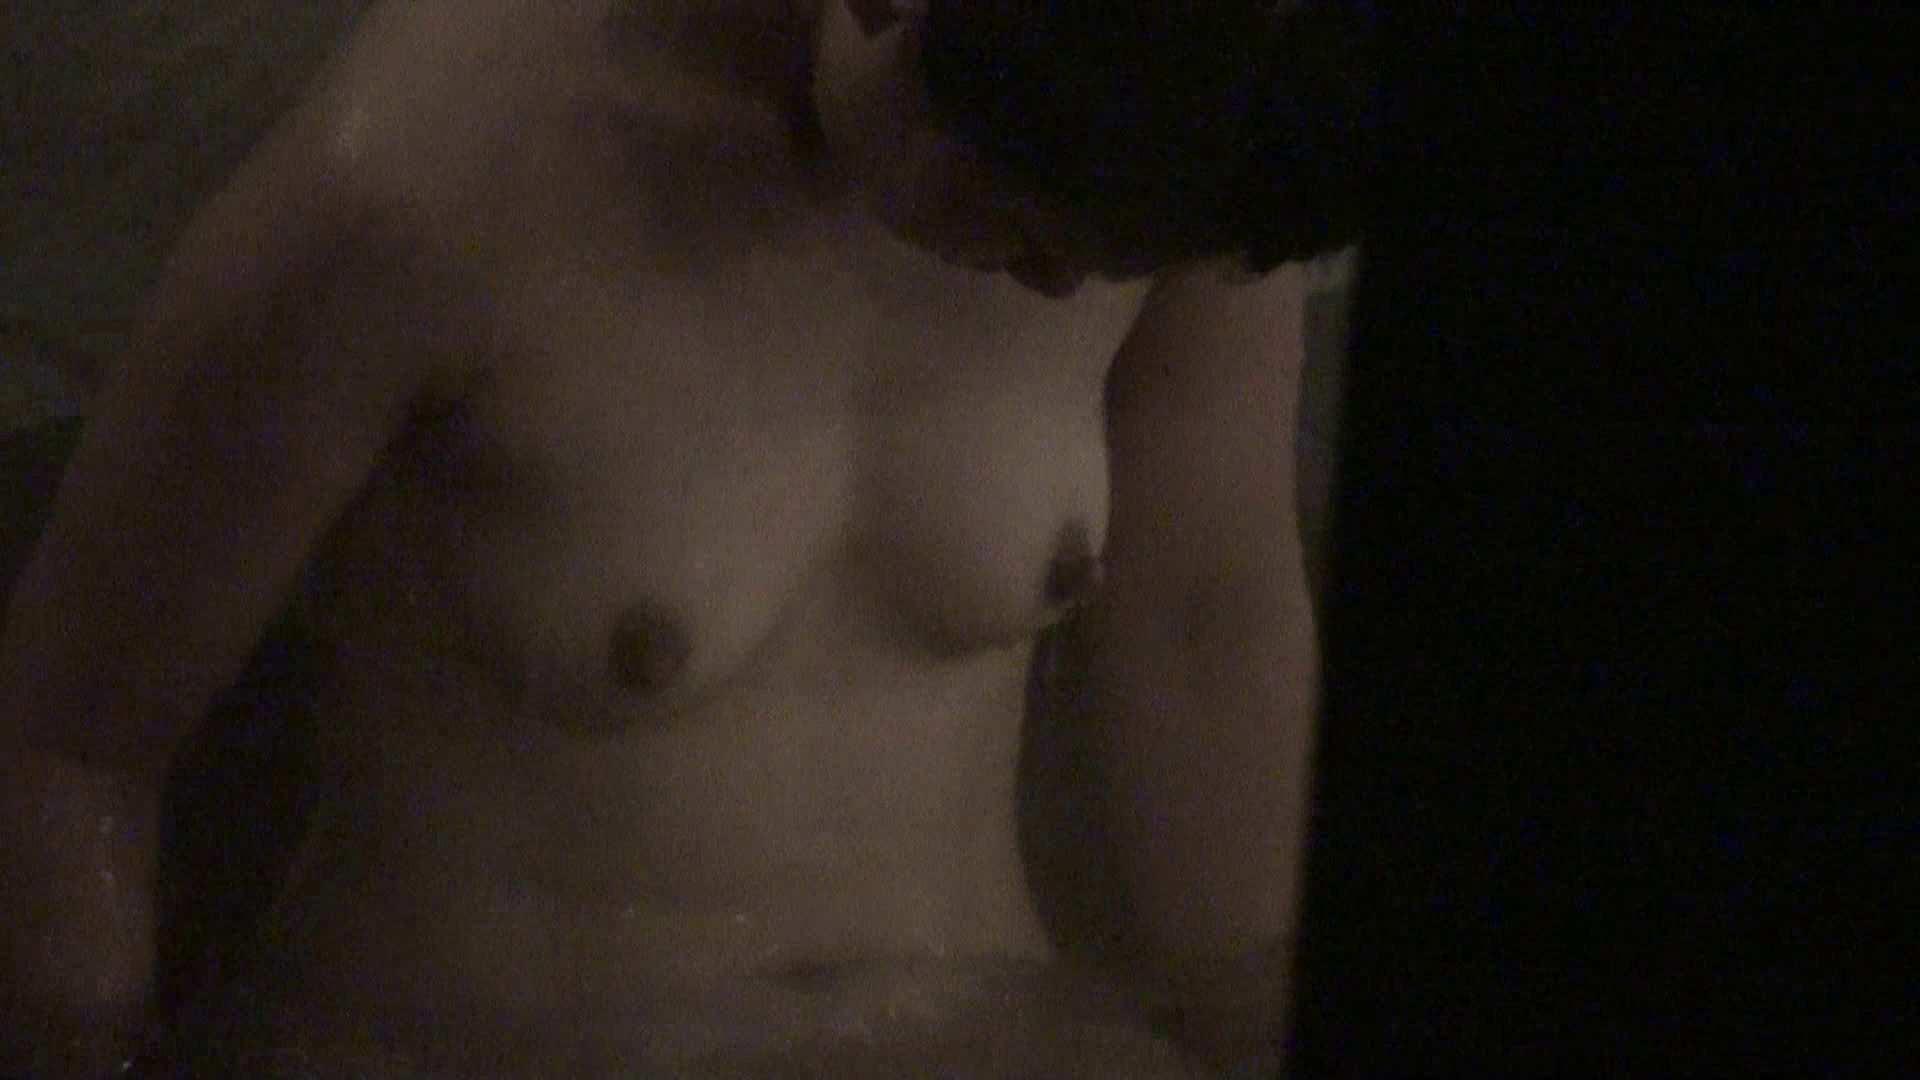 Aquaな露天風呂Vol.426 美しいOLの裸体 AV無料動画キャプチャ 70pic 35